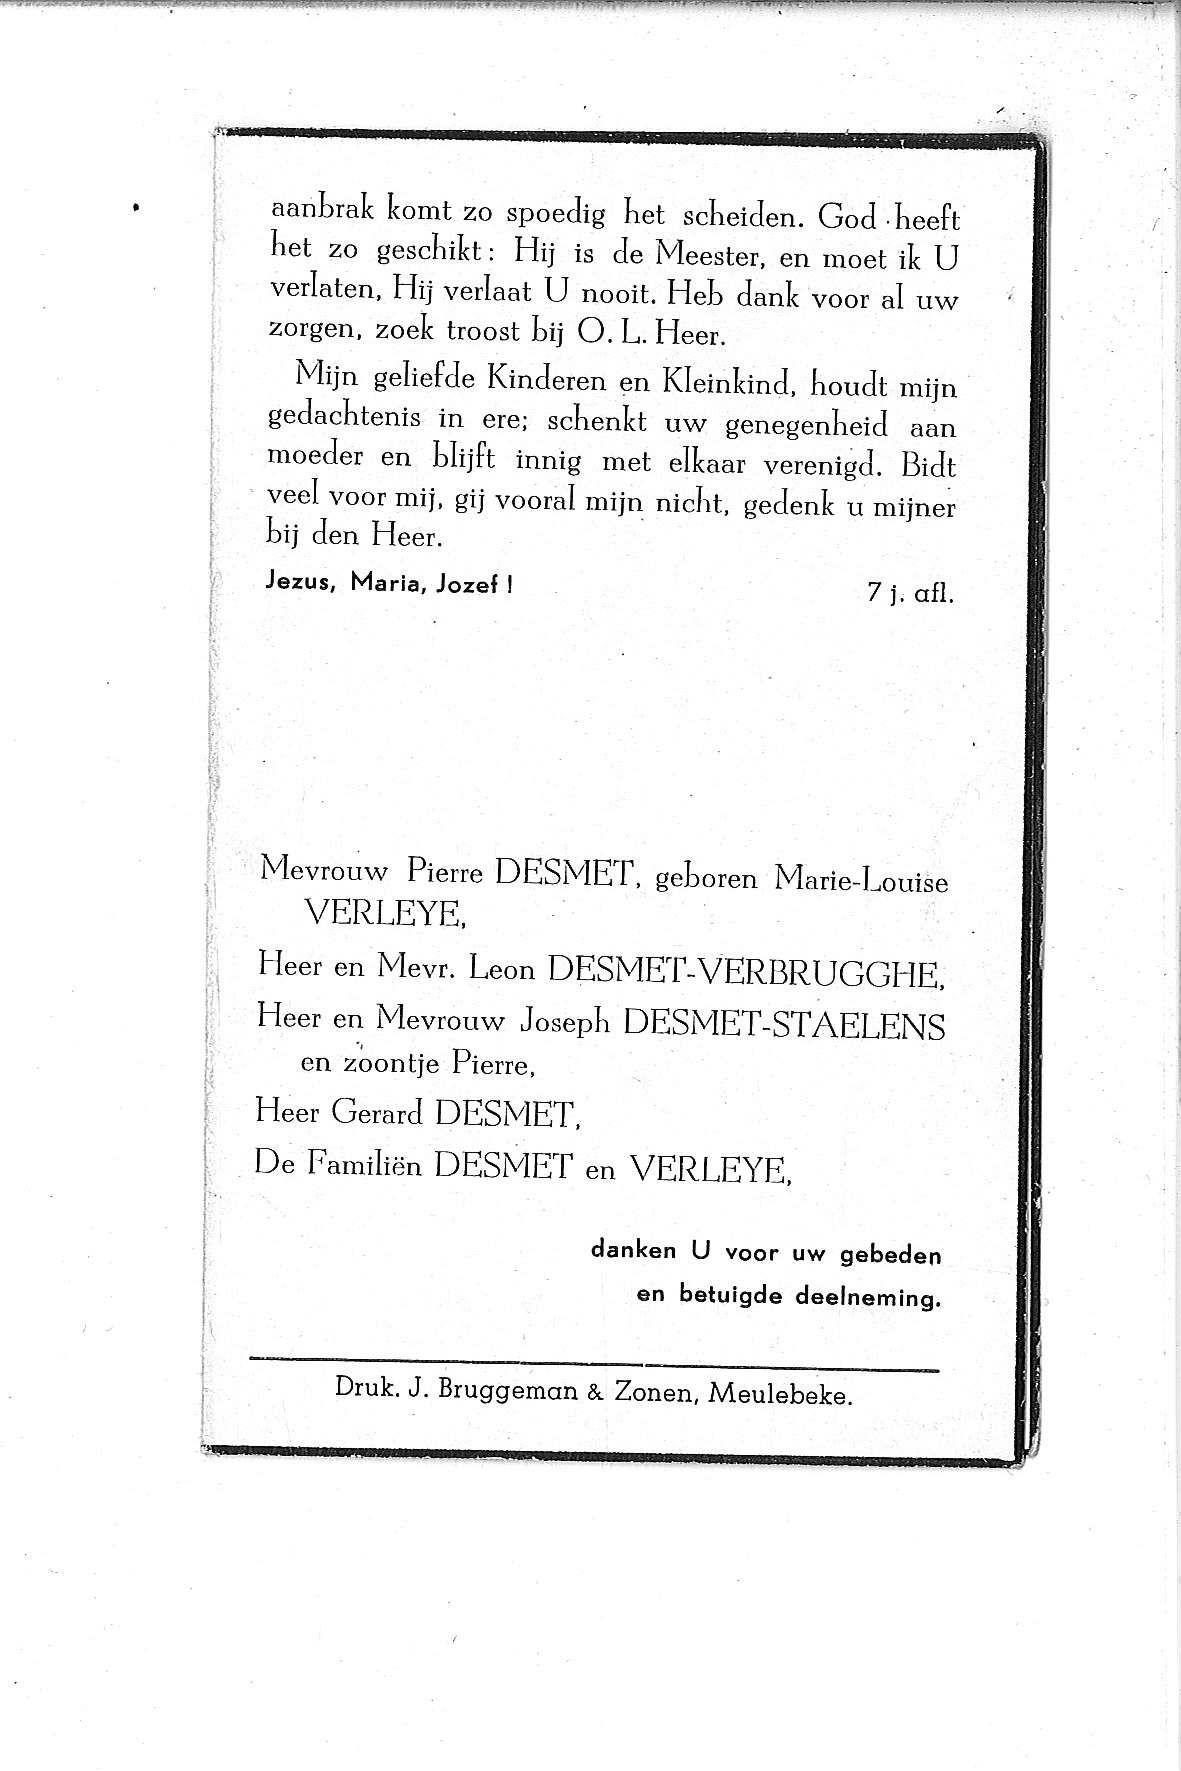 Pierre-Willibrordus (1948) 20120424113911_00120.jpg